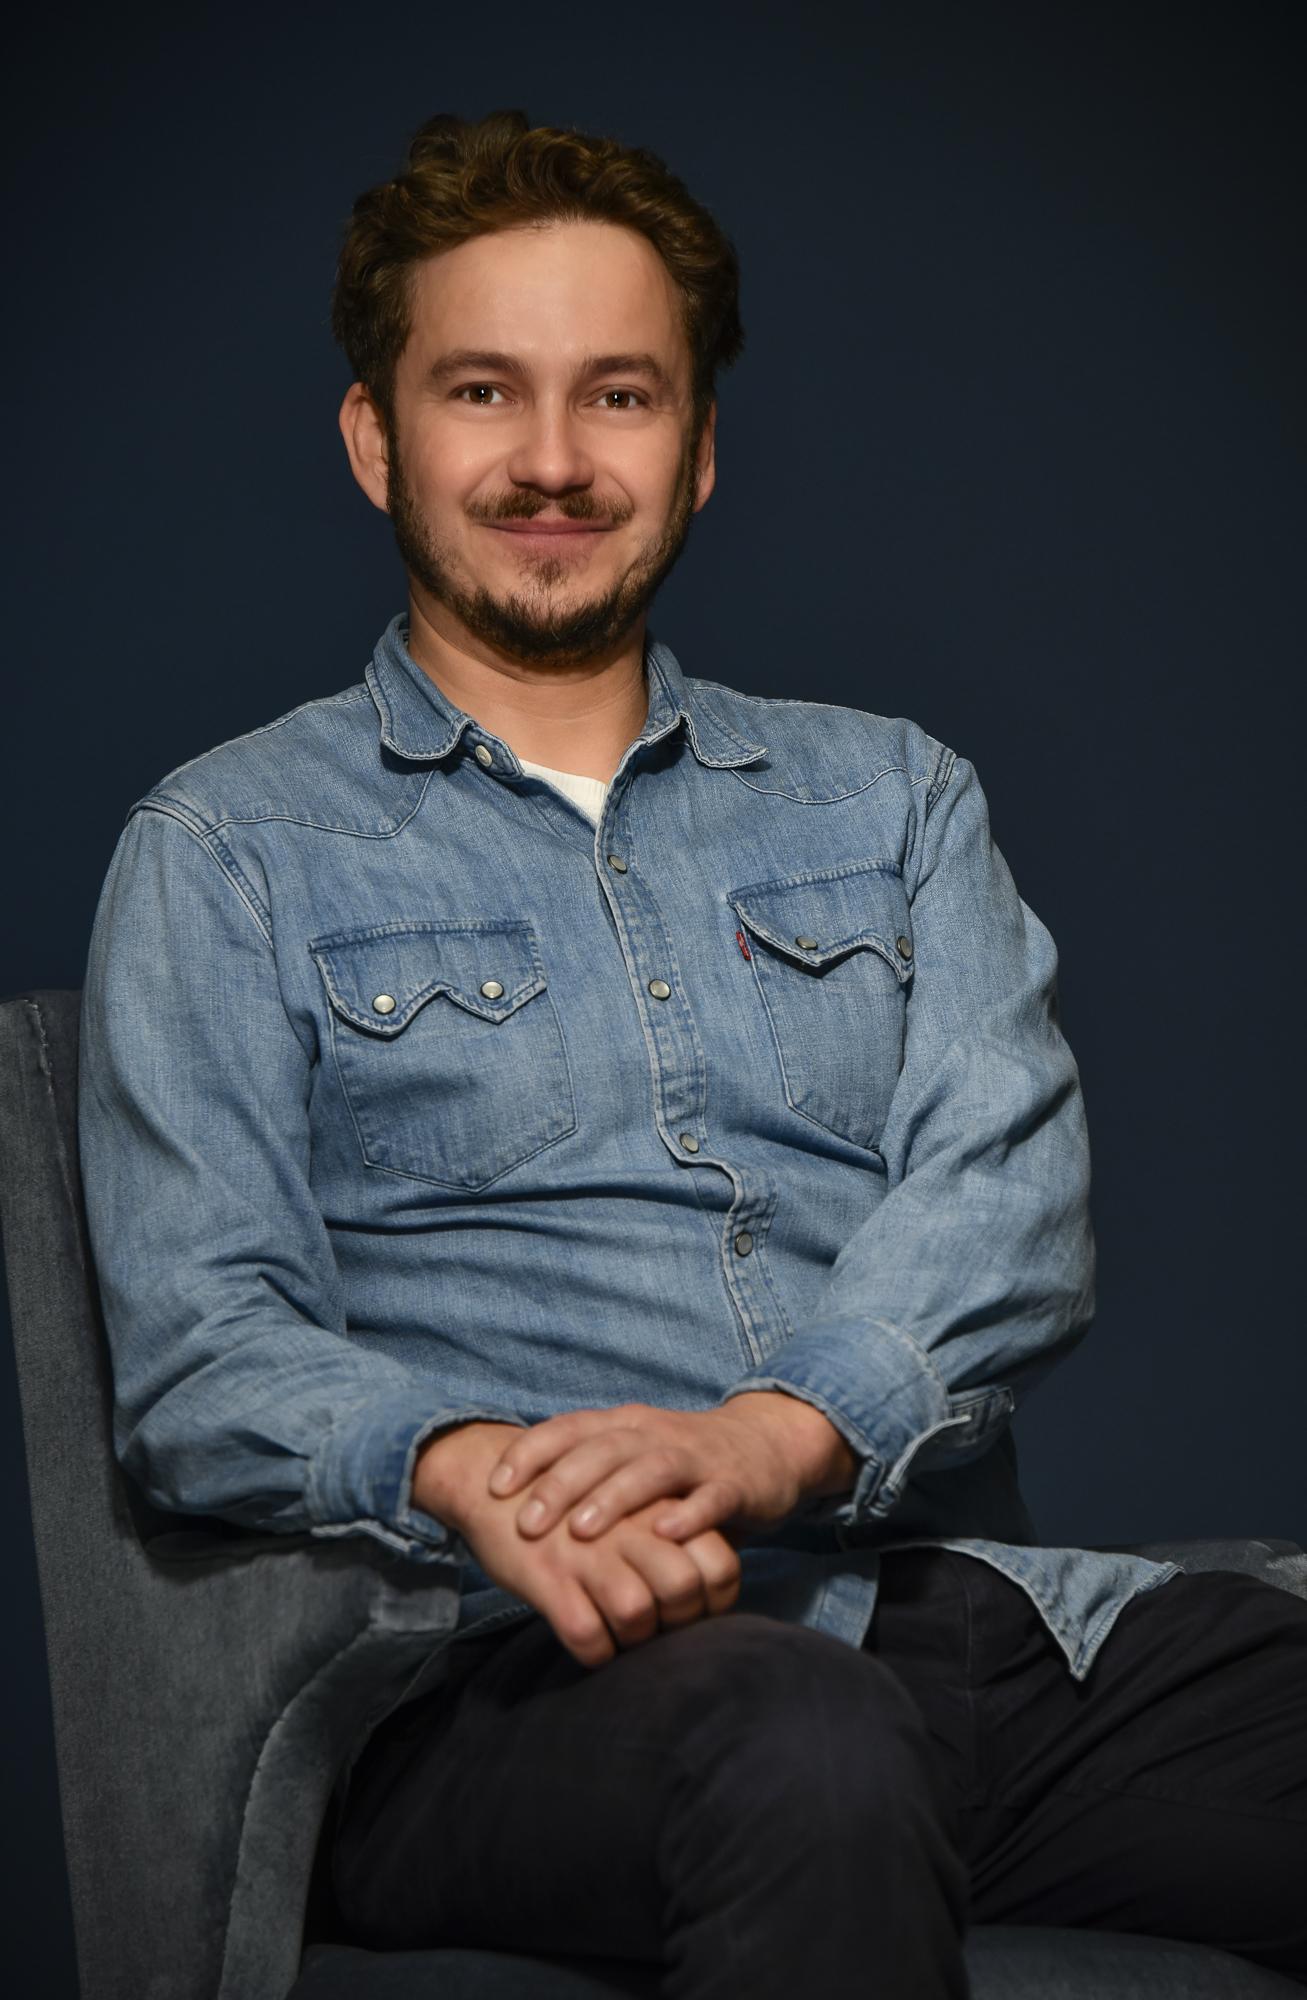 Filip Hlavinka